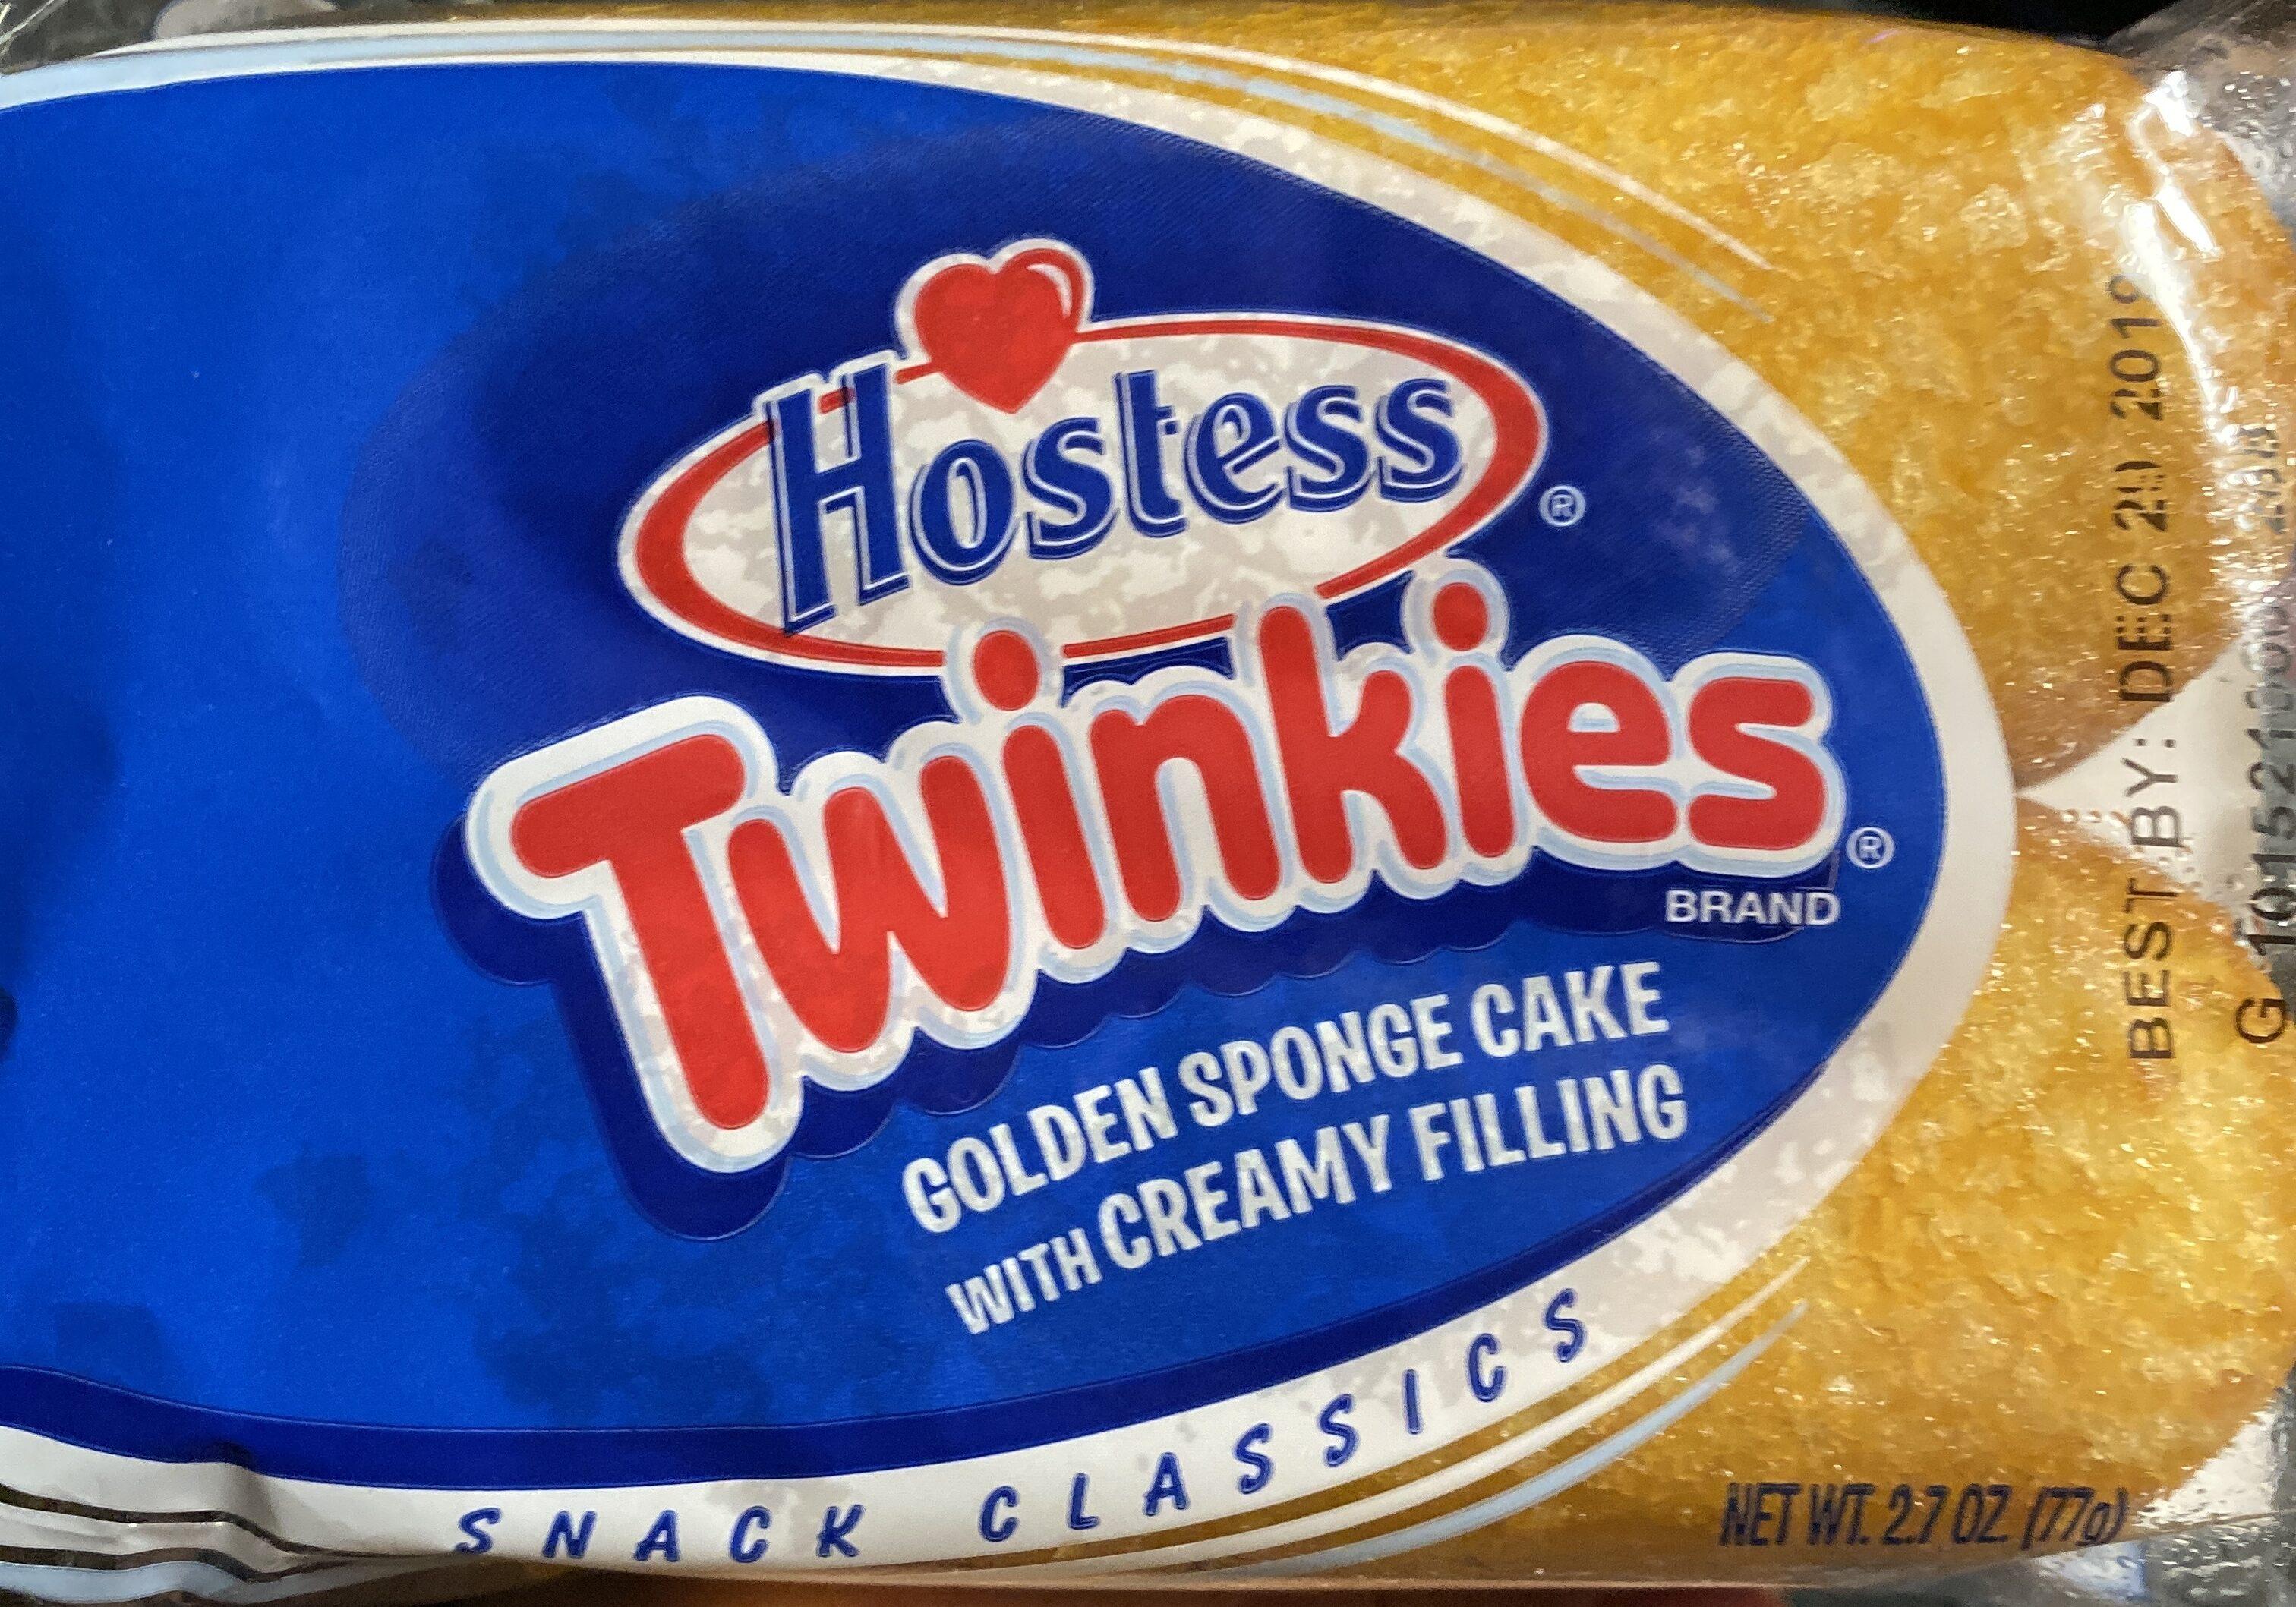 Golden sponge cake with creamy filling - Product - en